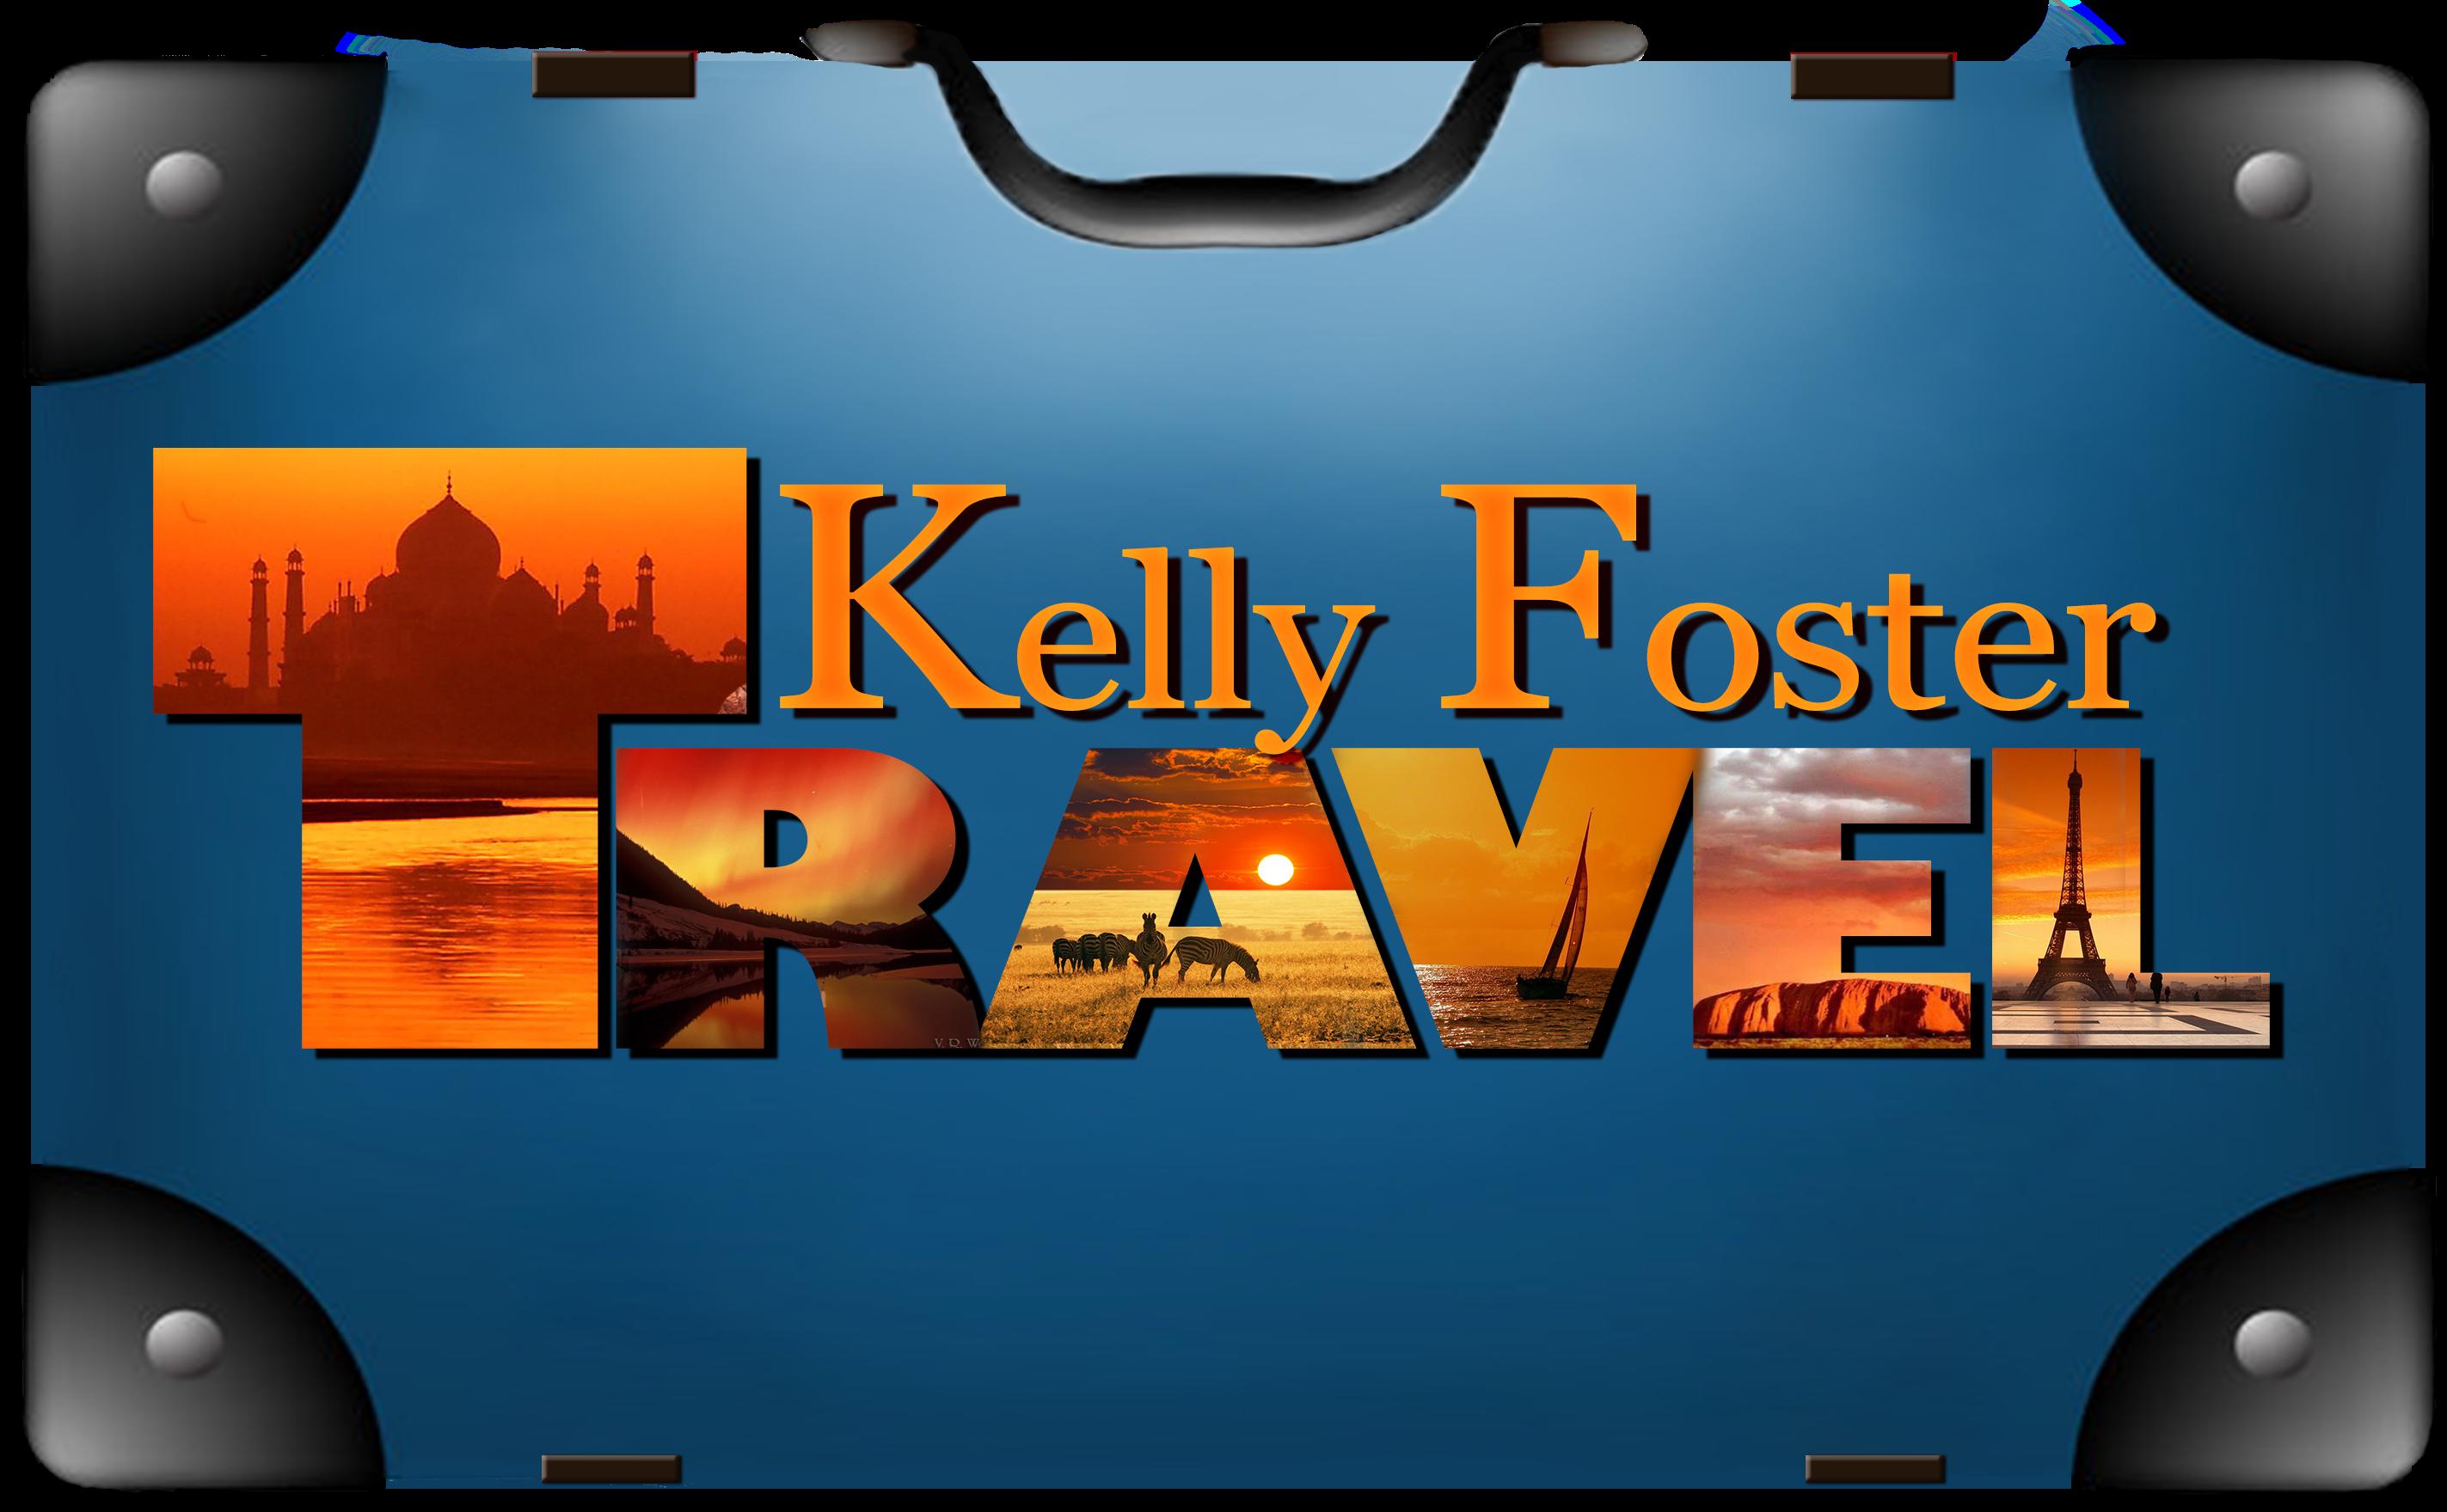 Kelly Foster TPI Travel